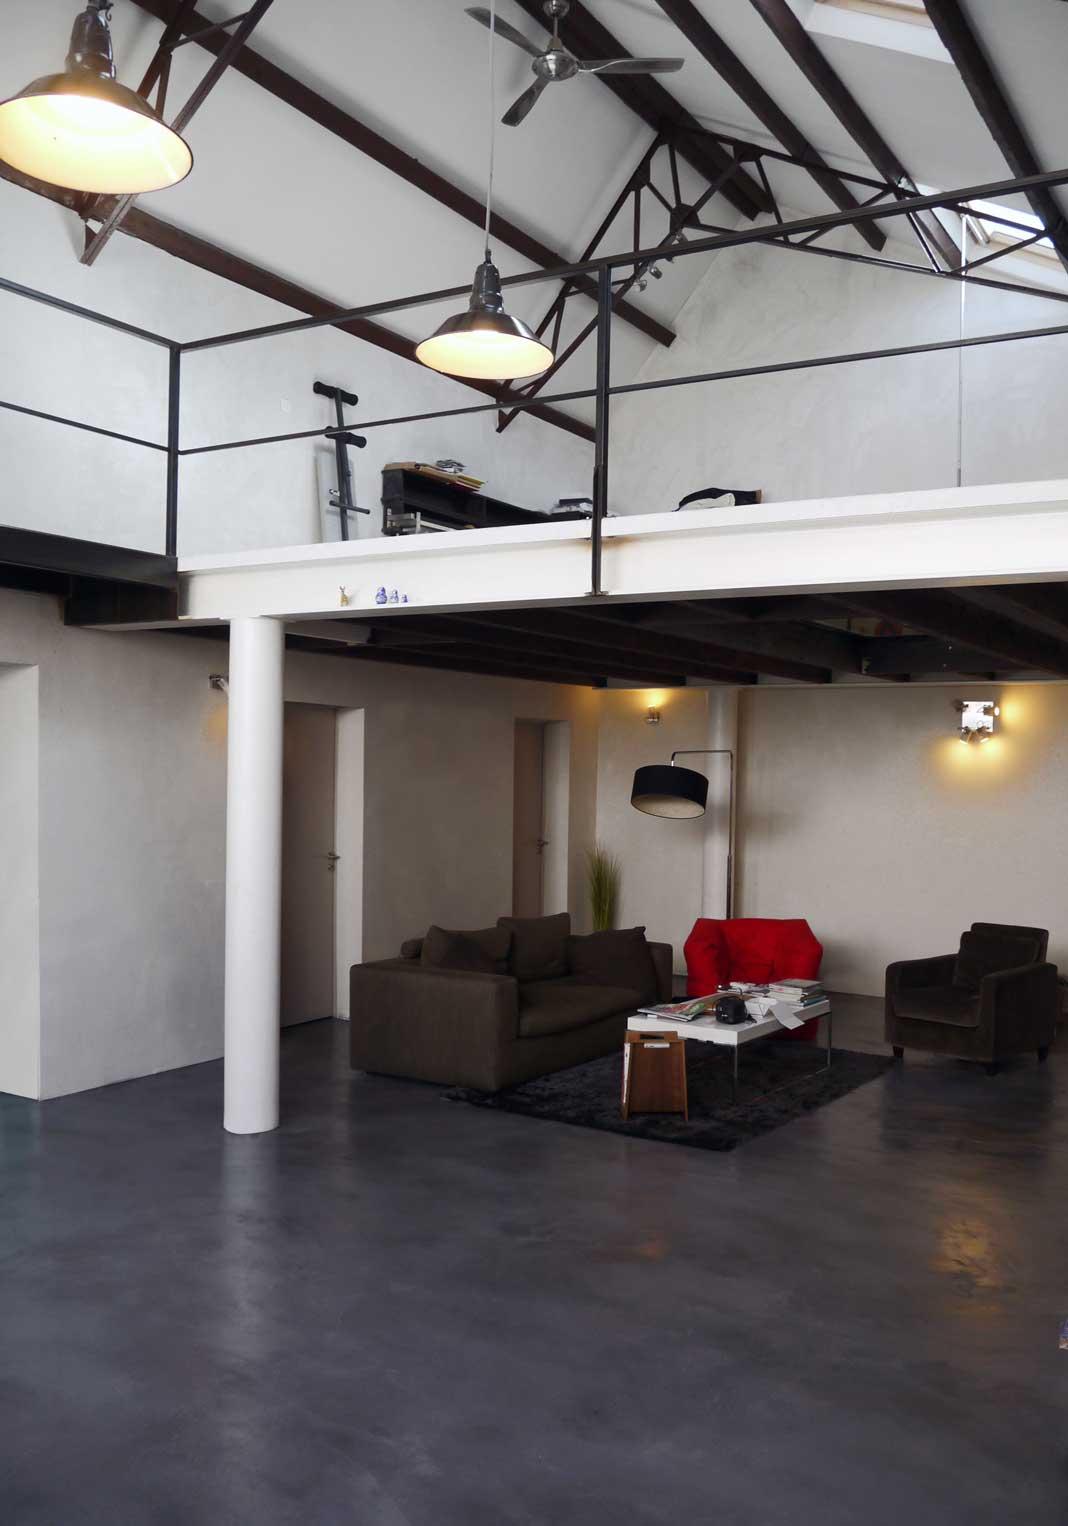 b ton cir gris dans un loft. Black Bedroom Furniture Sets. Home Design Ideas